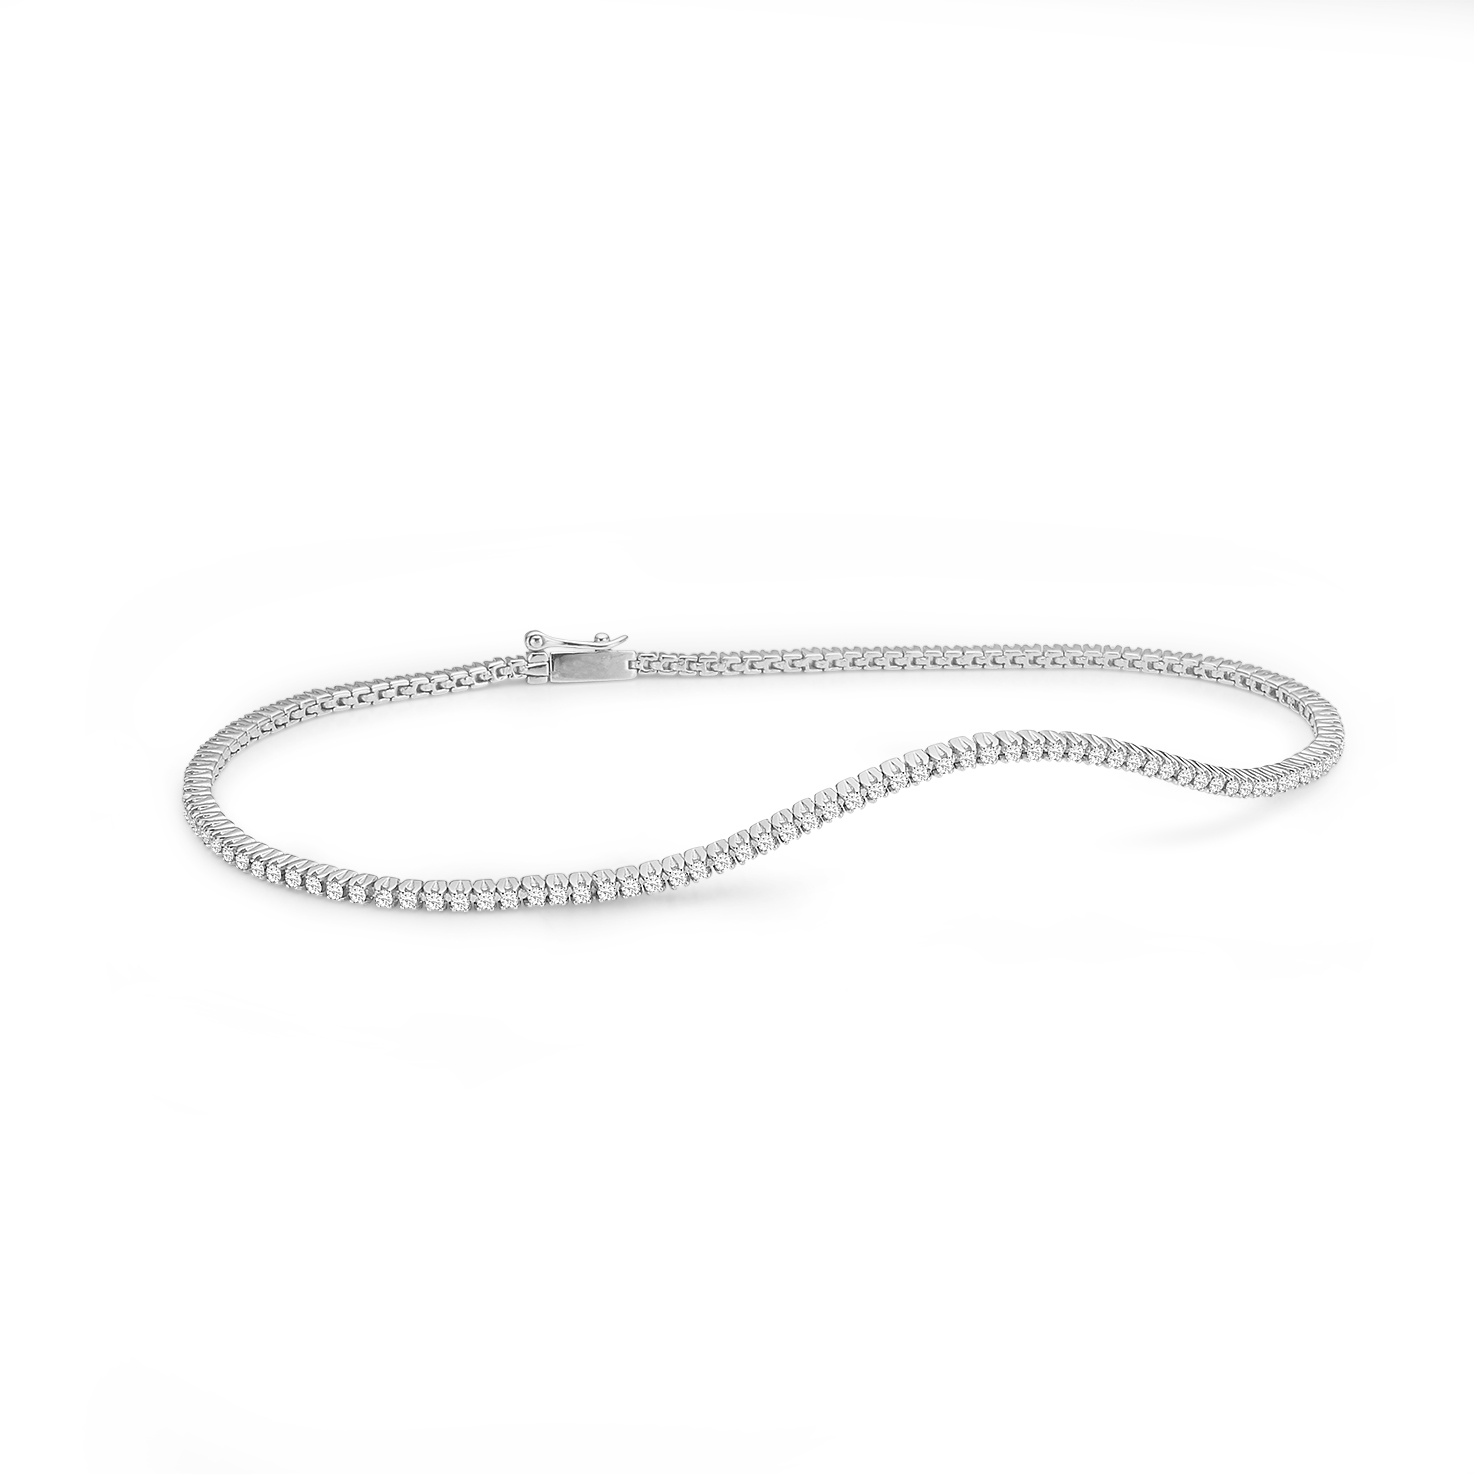 Aagaard 14 kt hvidguld armbånd med diamanter - 44101797-18 18 centimeter